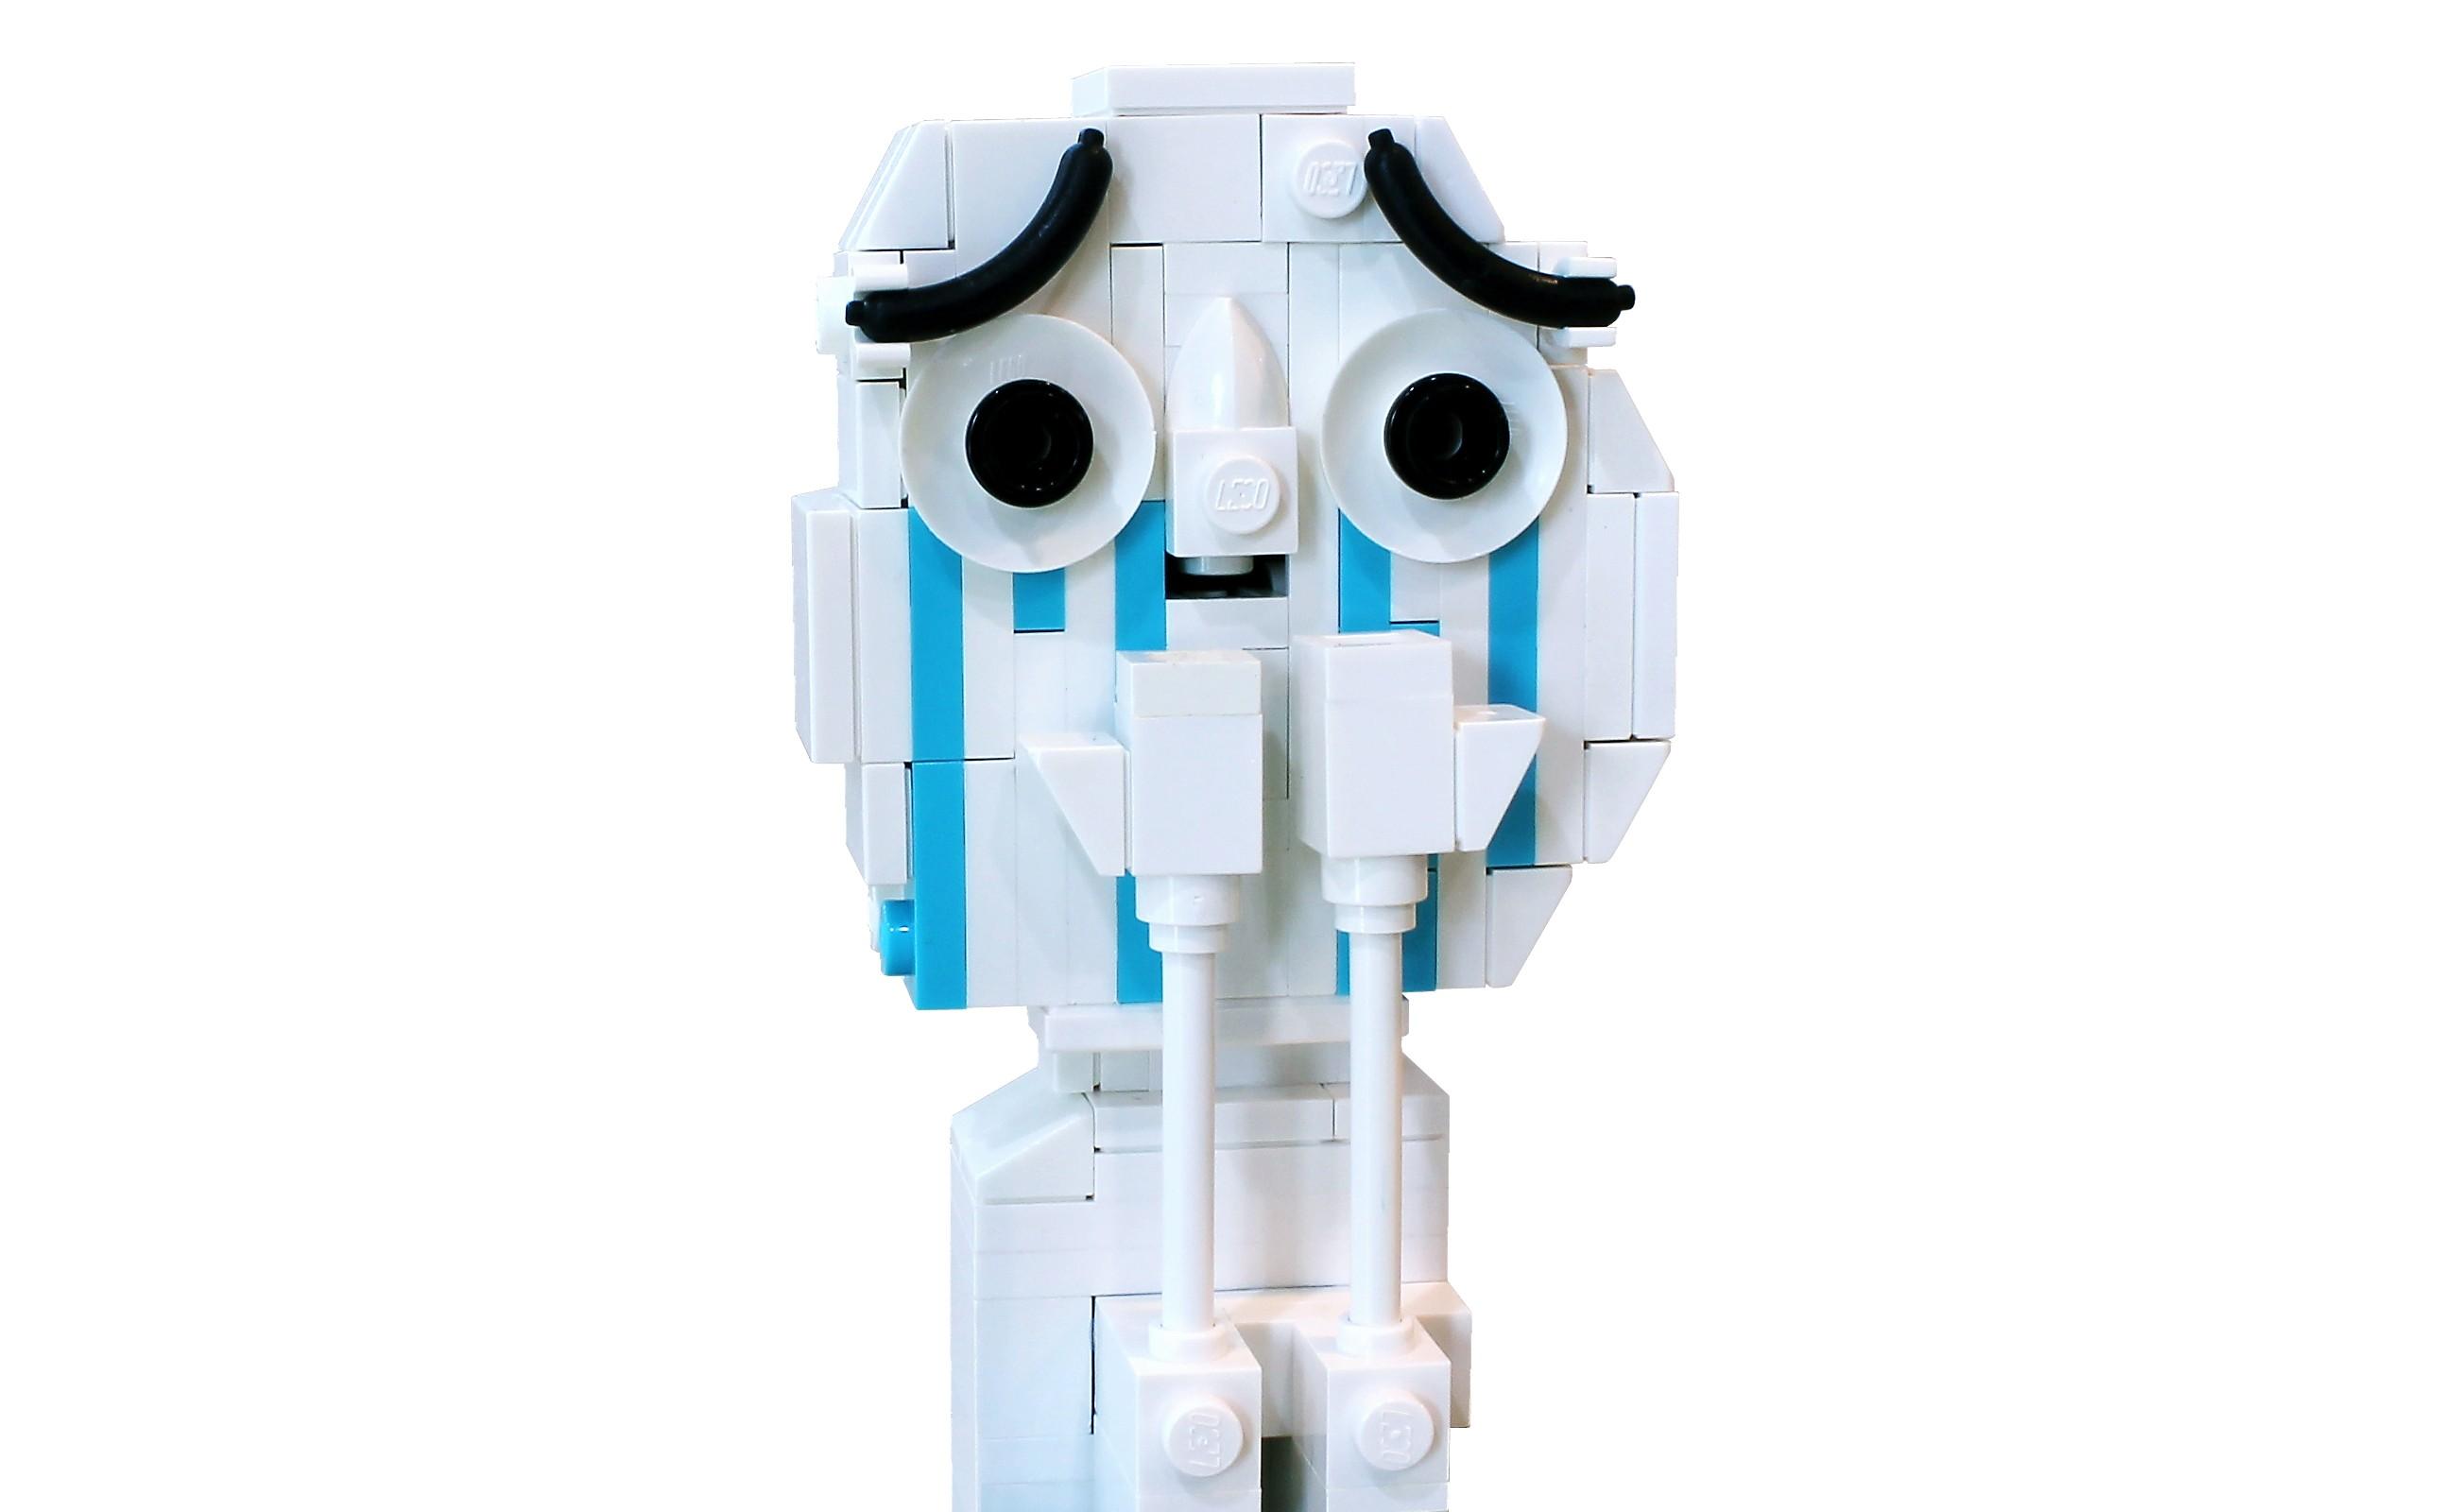 cute face tears comic LEGO crying rage meme cuteness overload moc afol 980921 wallpaper cute, face, tears, comic, lego, crying, rage, meme